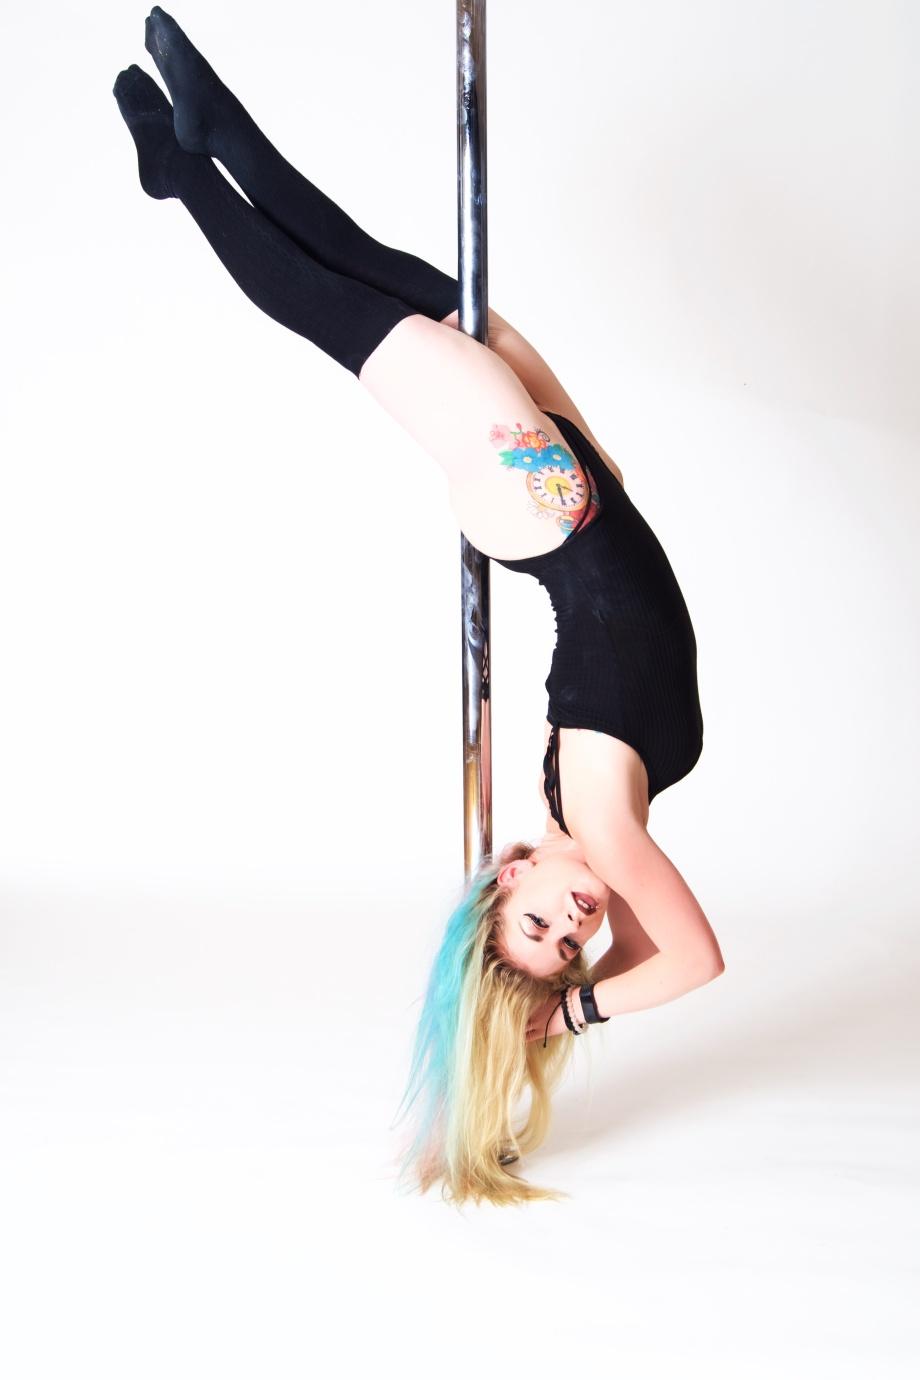 pole photography, pole fitness, Jenny Schmiedel, Die Baroness, glamour, cork, ireland, blonde, legs